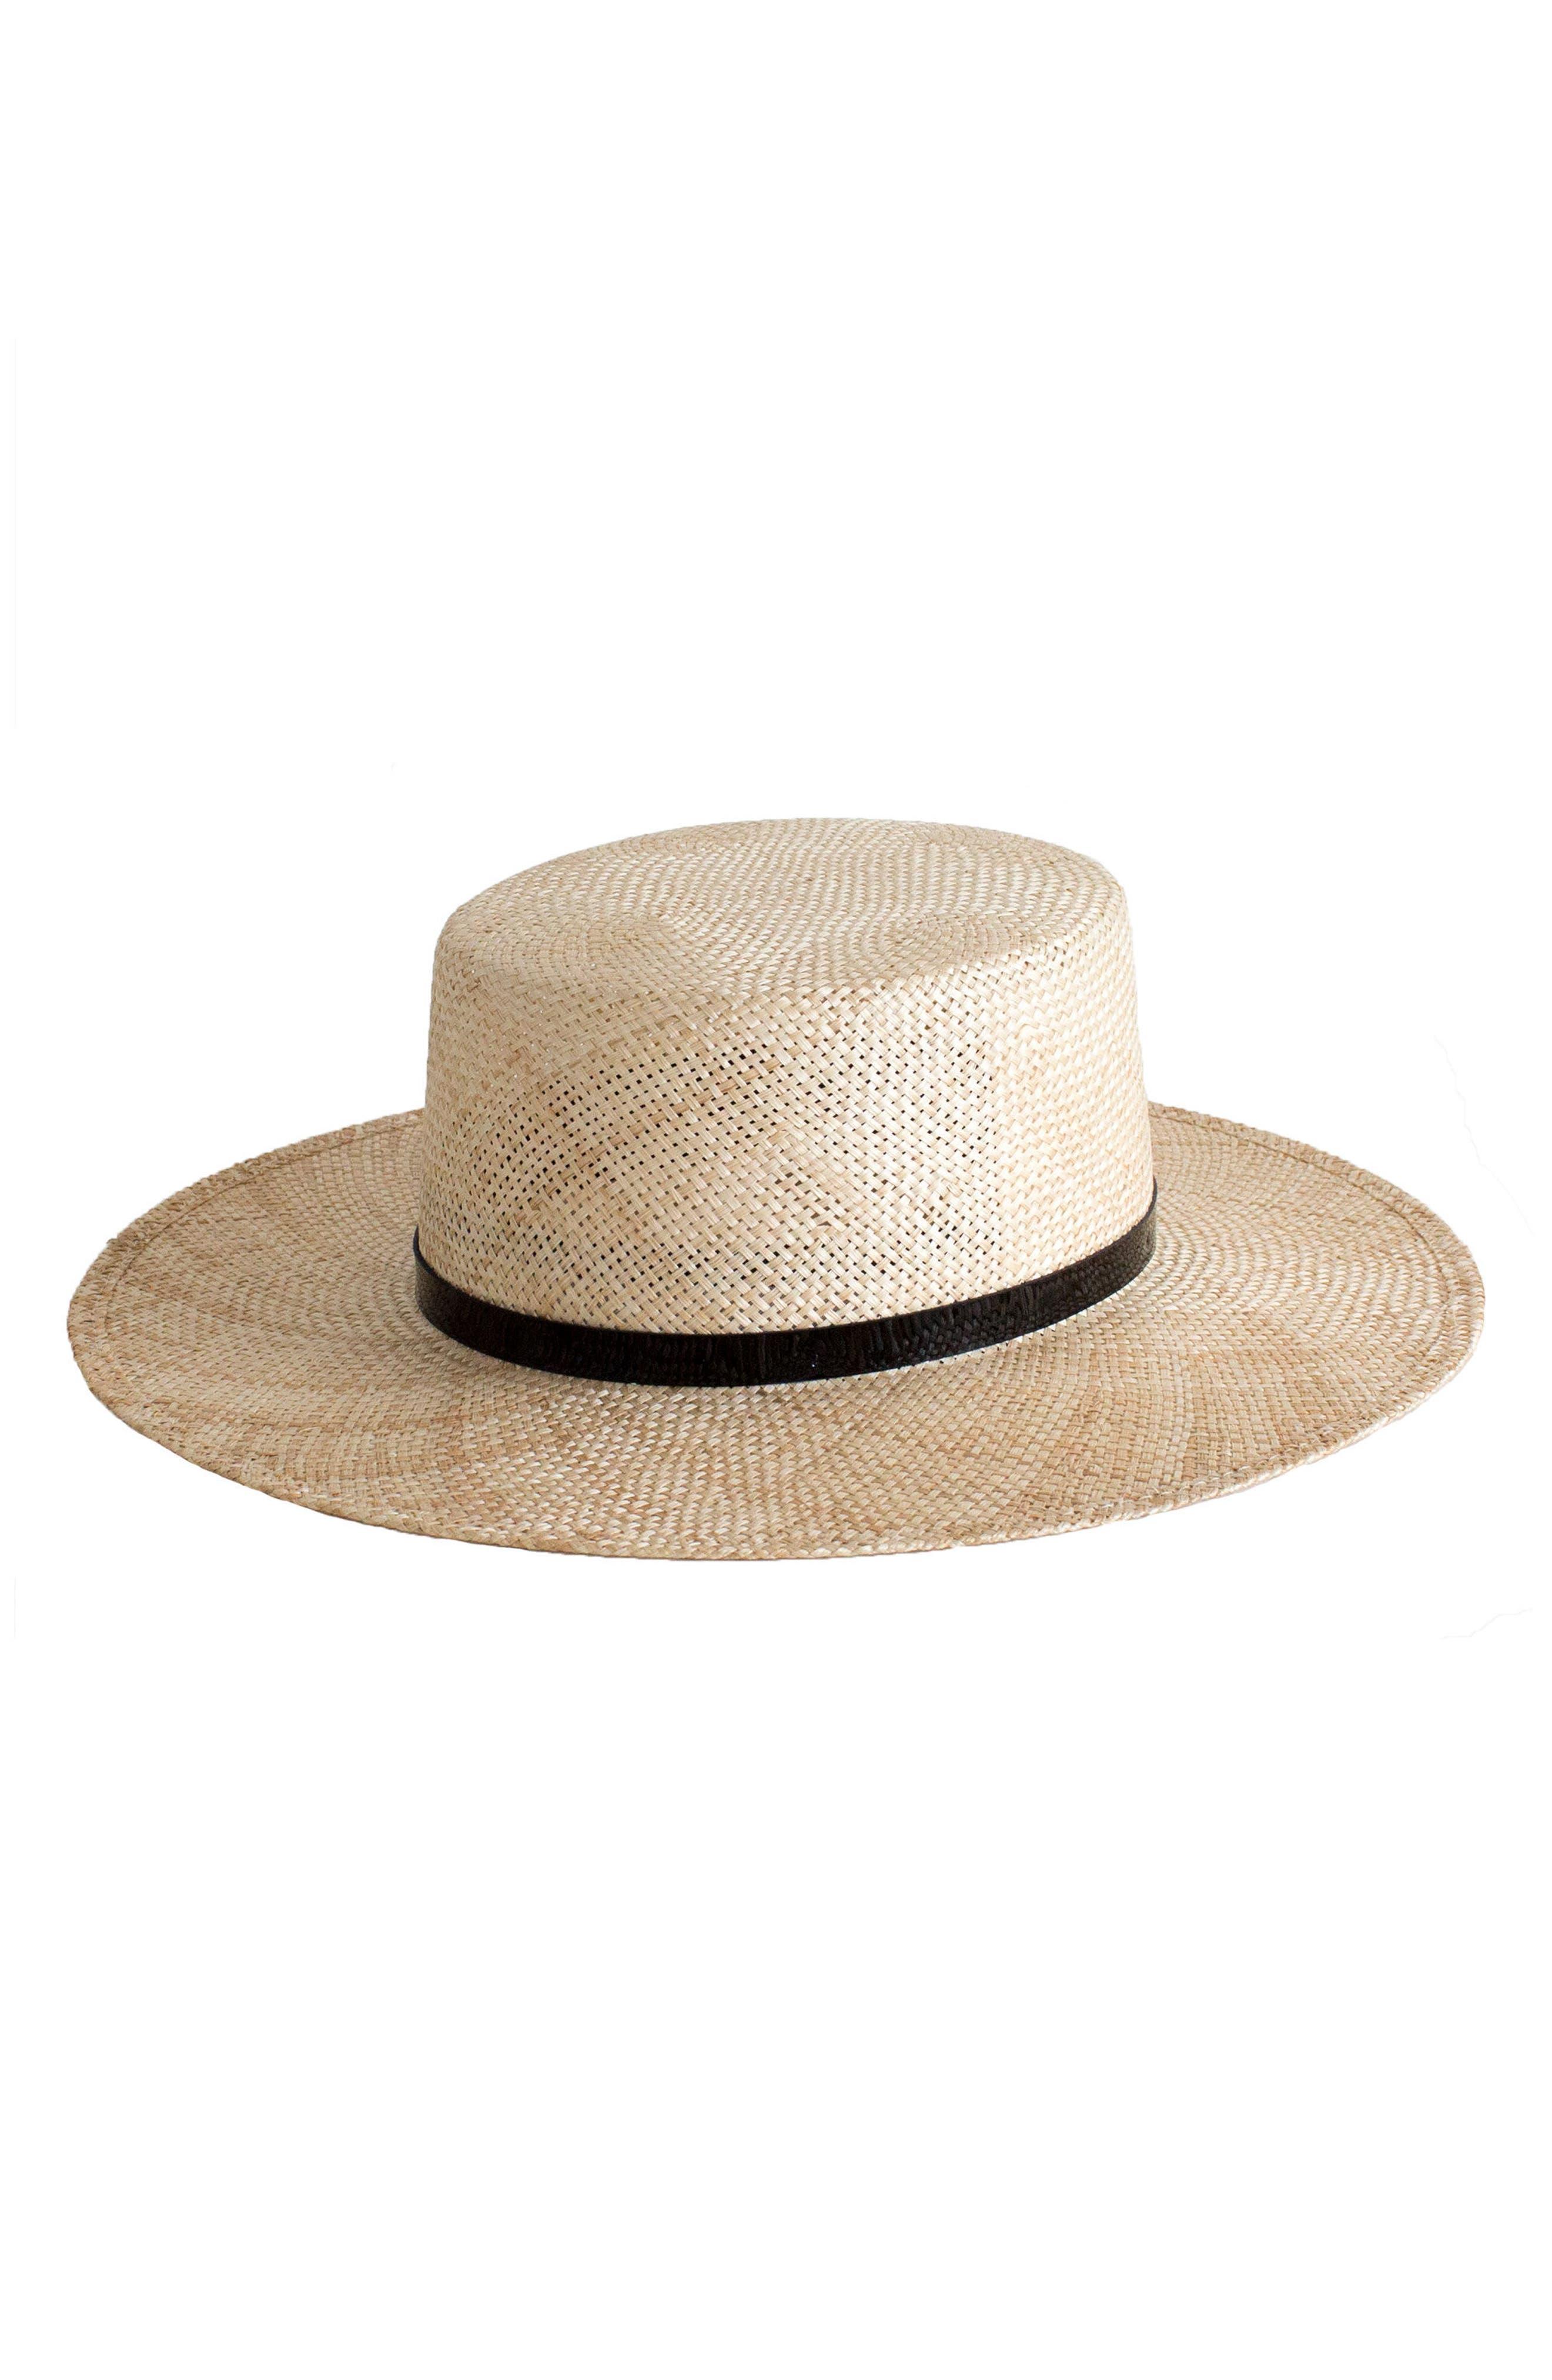 Janessa Leone Mason Straw Hat